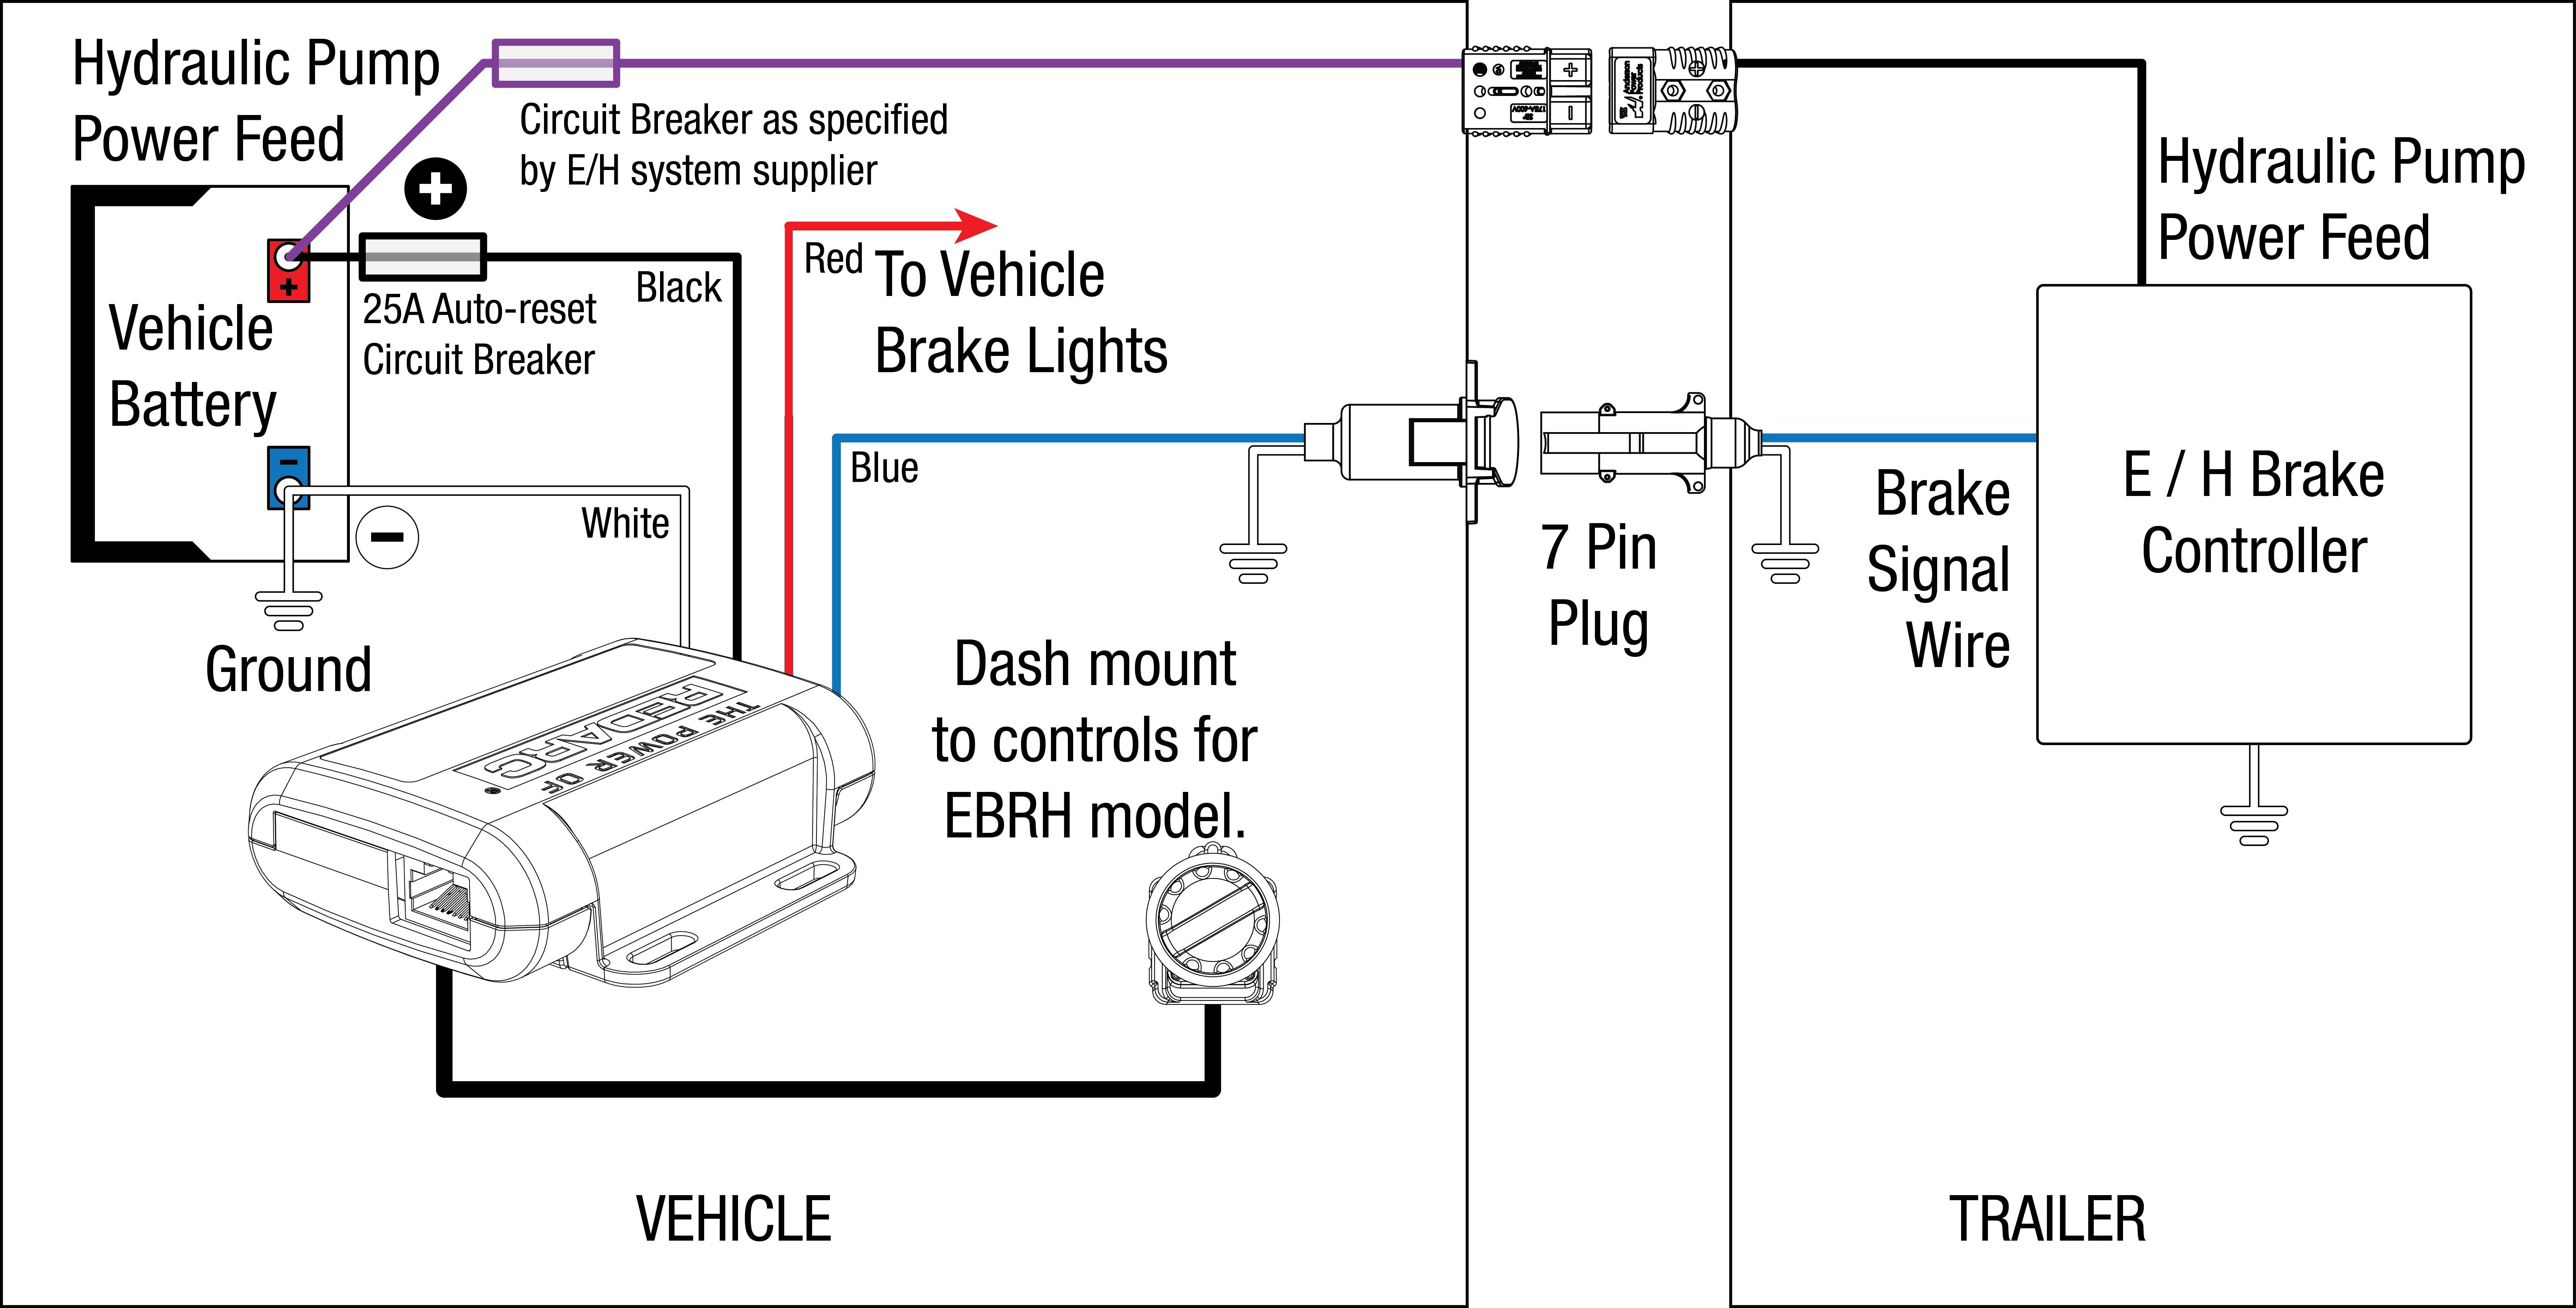 Brake Light Wiring Diagram Luxury 3 Wire Tail Light Wiring Diagram Diagram Of Brake Light Wiring Diagram